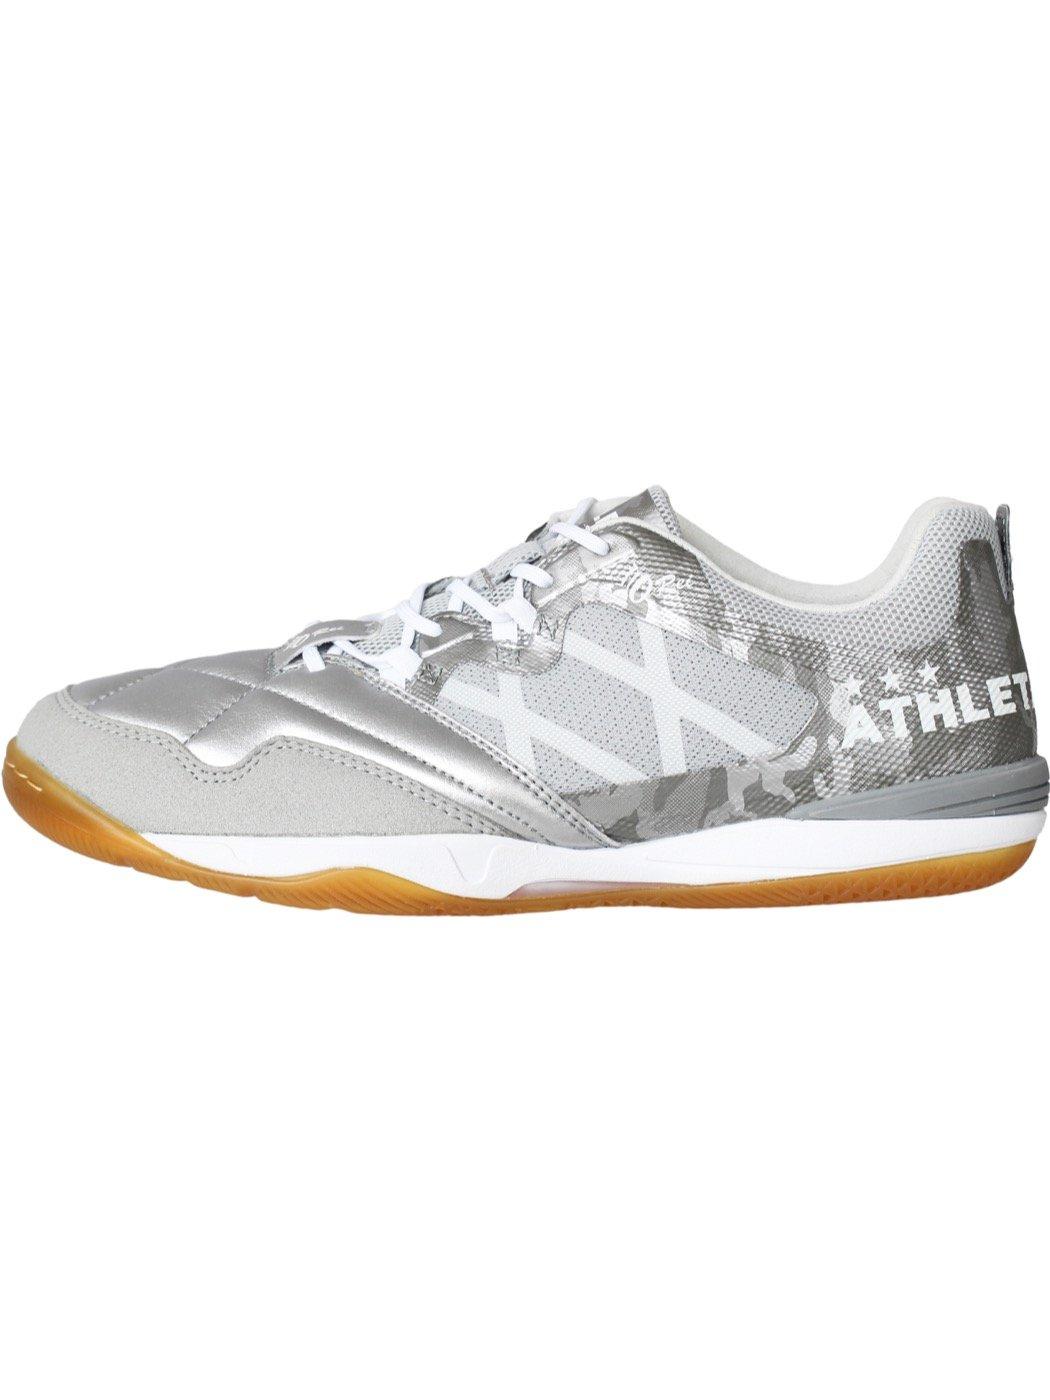 ATHLETA(アスレタ) O-Rei Futsal Falcao 11003-SIWH B075M8Z551 25.5|シルバー/ホワイト シルバー/ホワイト 25.5